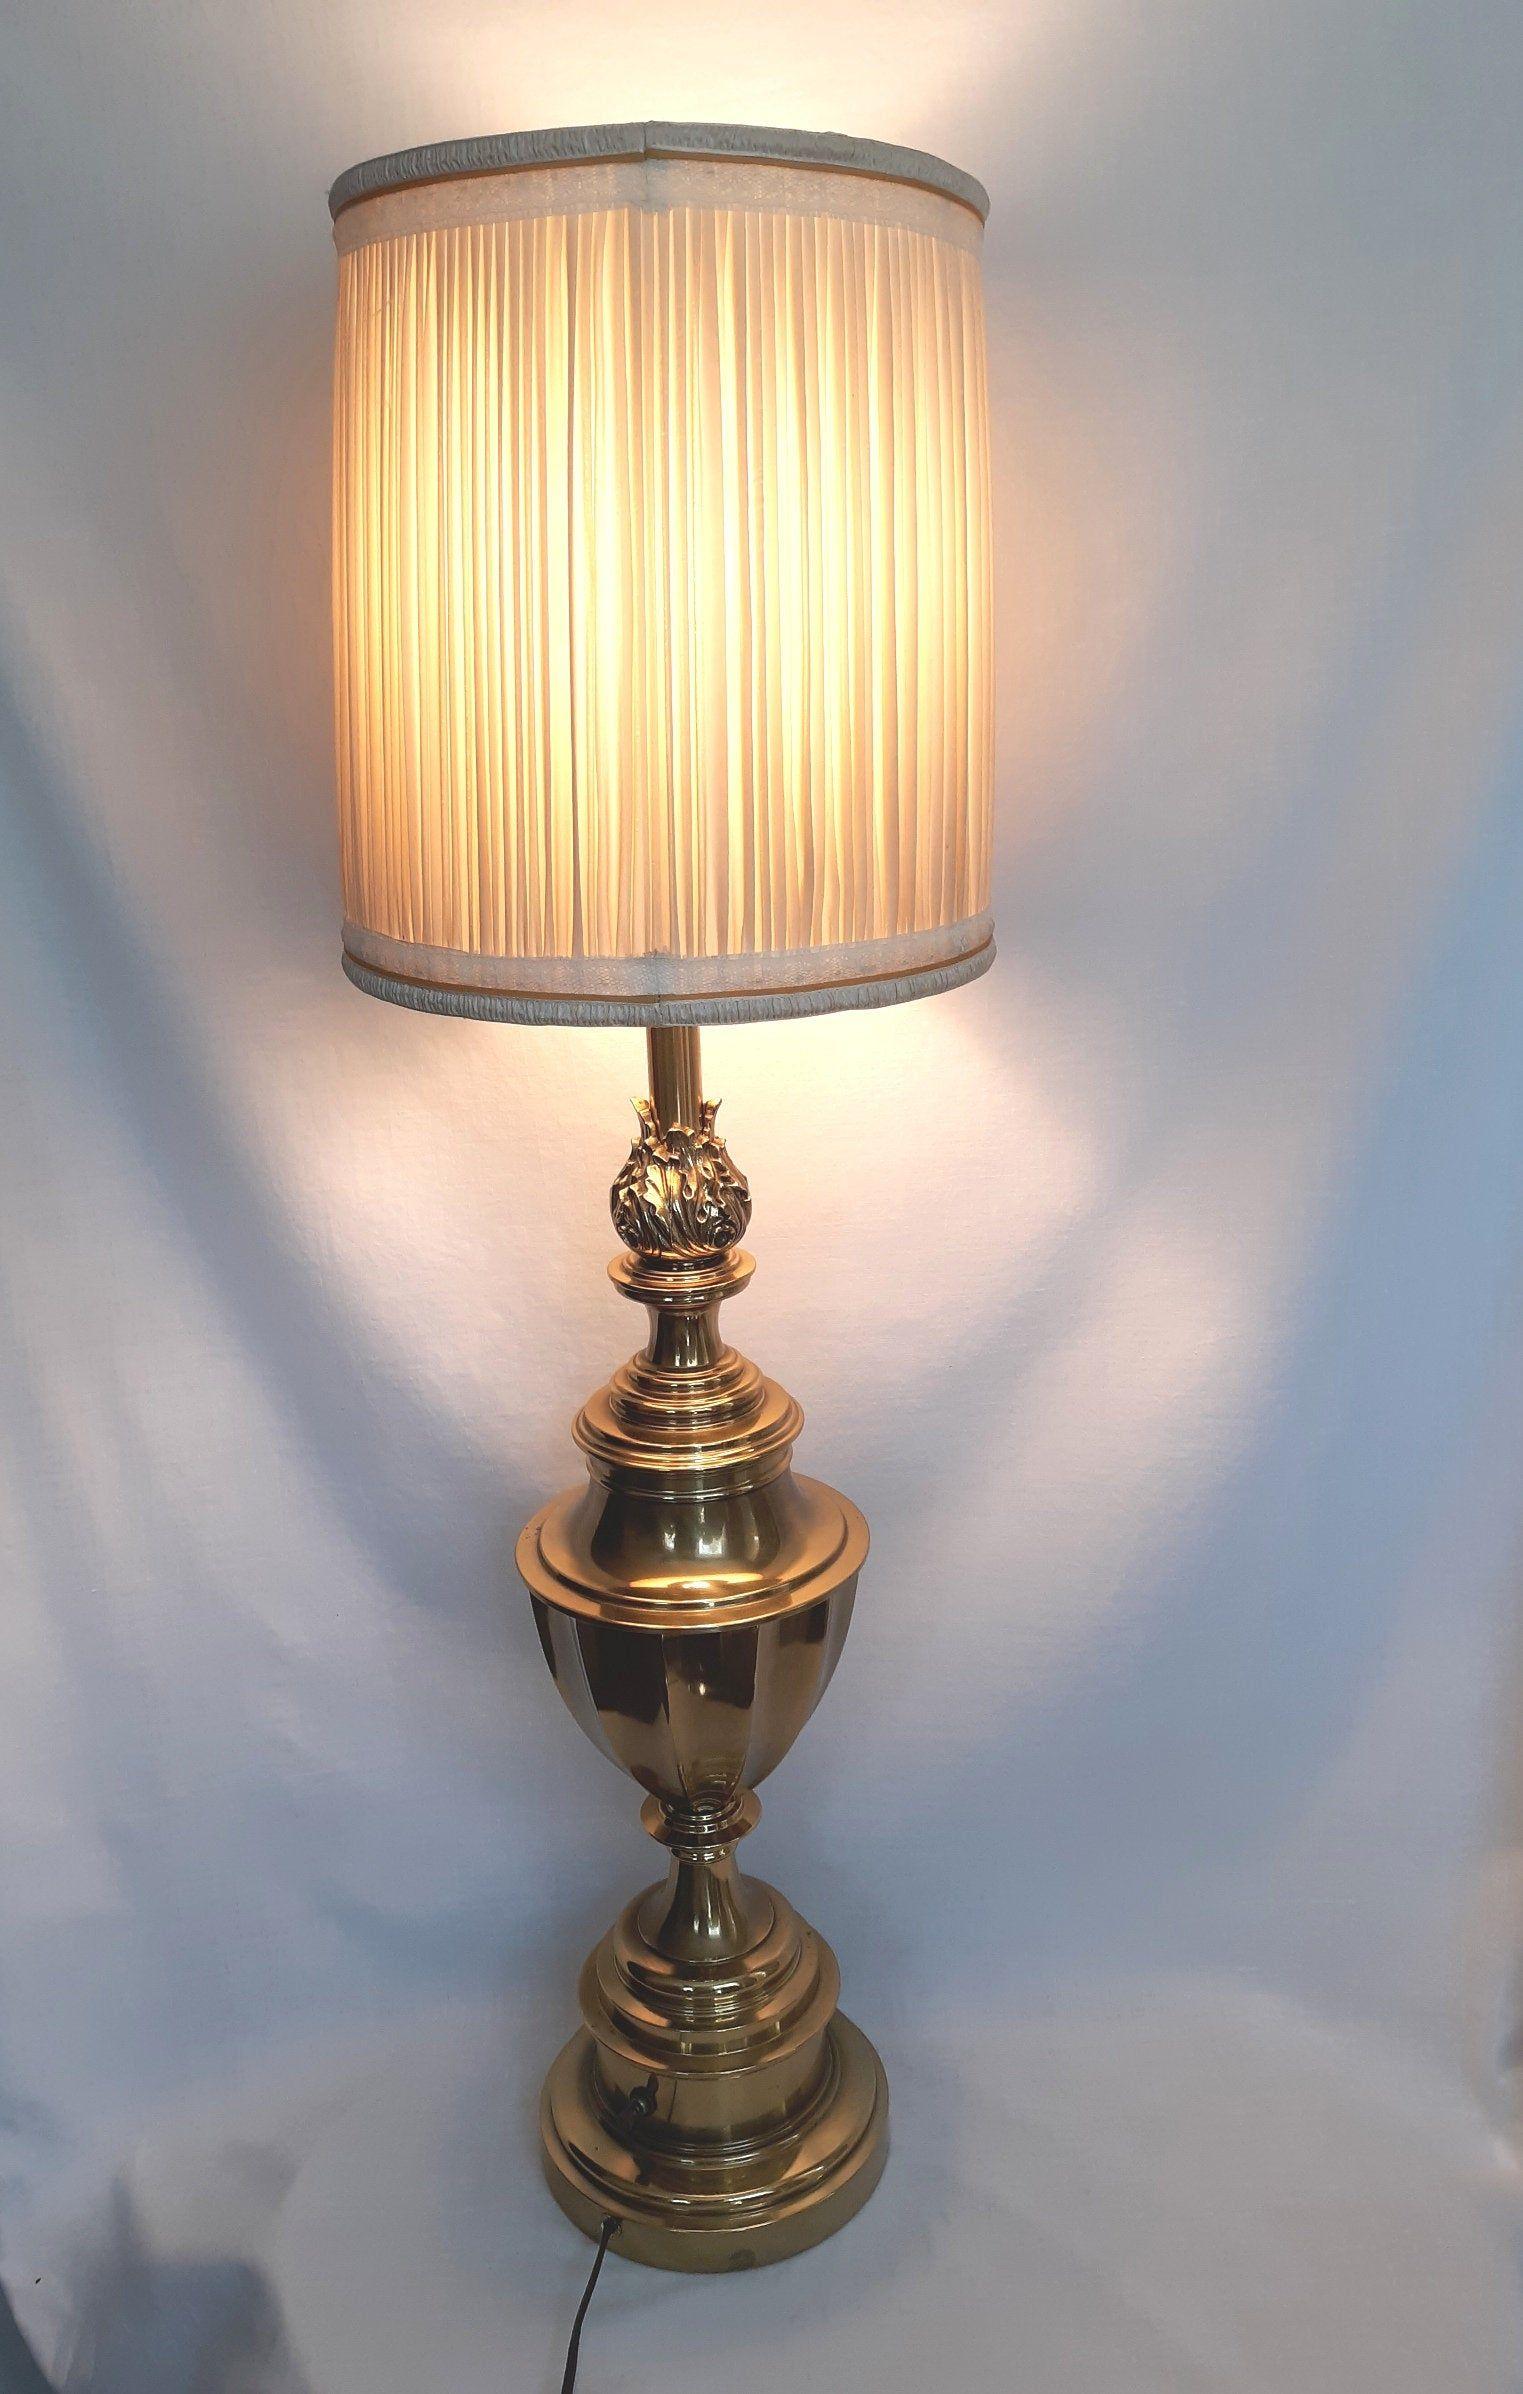 Stiffel Lamp Neoclassical Heavy Brass Flaming Torch Trophy Urn Lamp Hollywood Regency 3 Way Dresser Desk Retro Lamp w/Harp Fitter & Finial